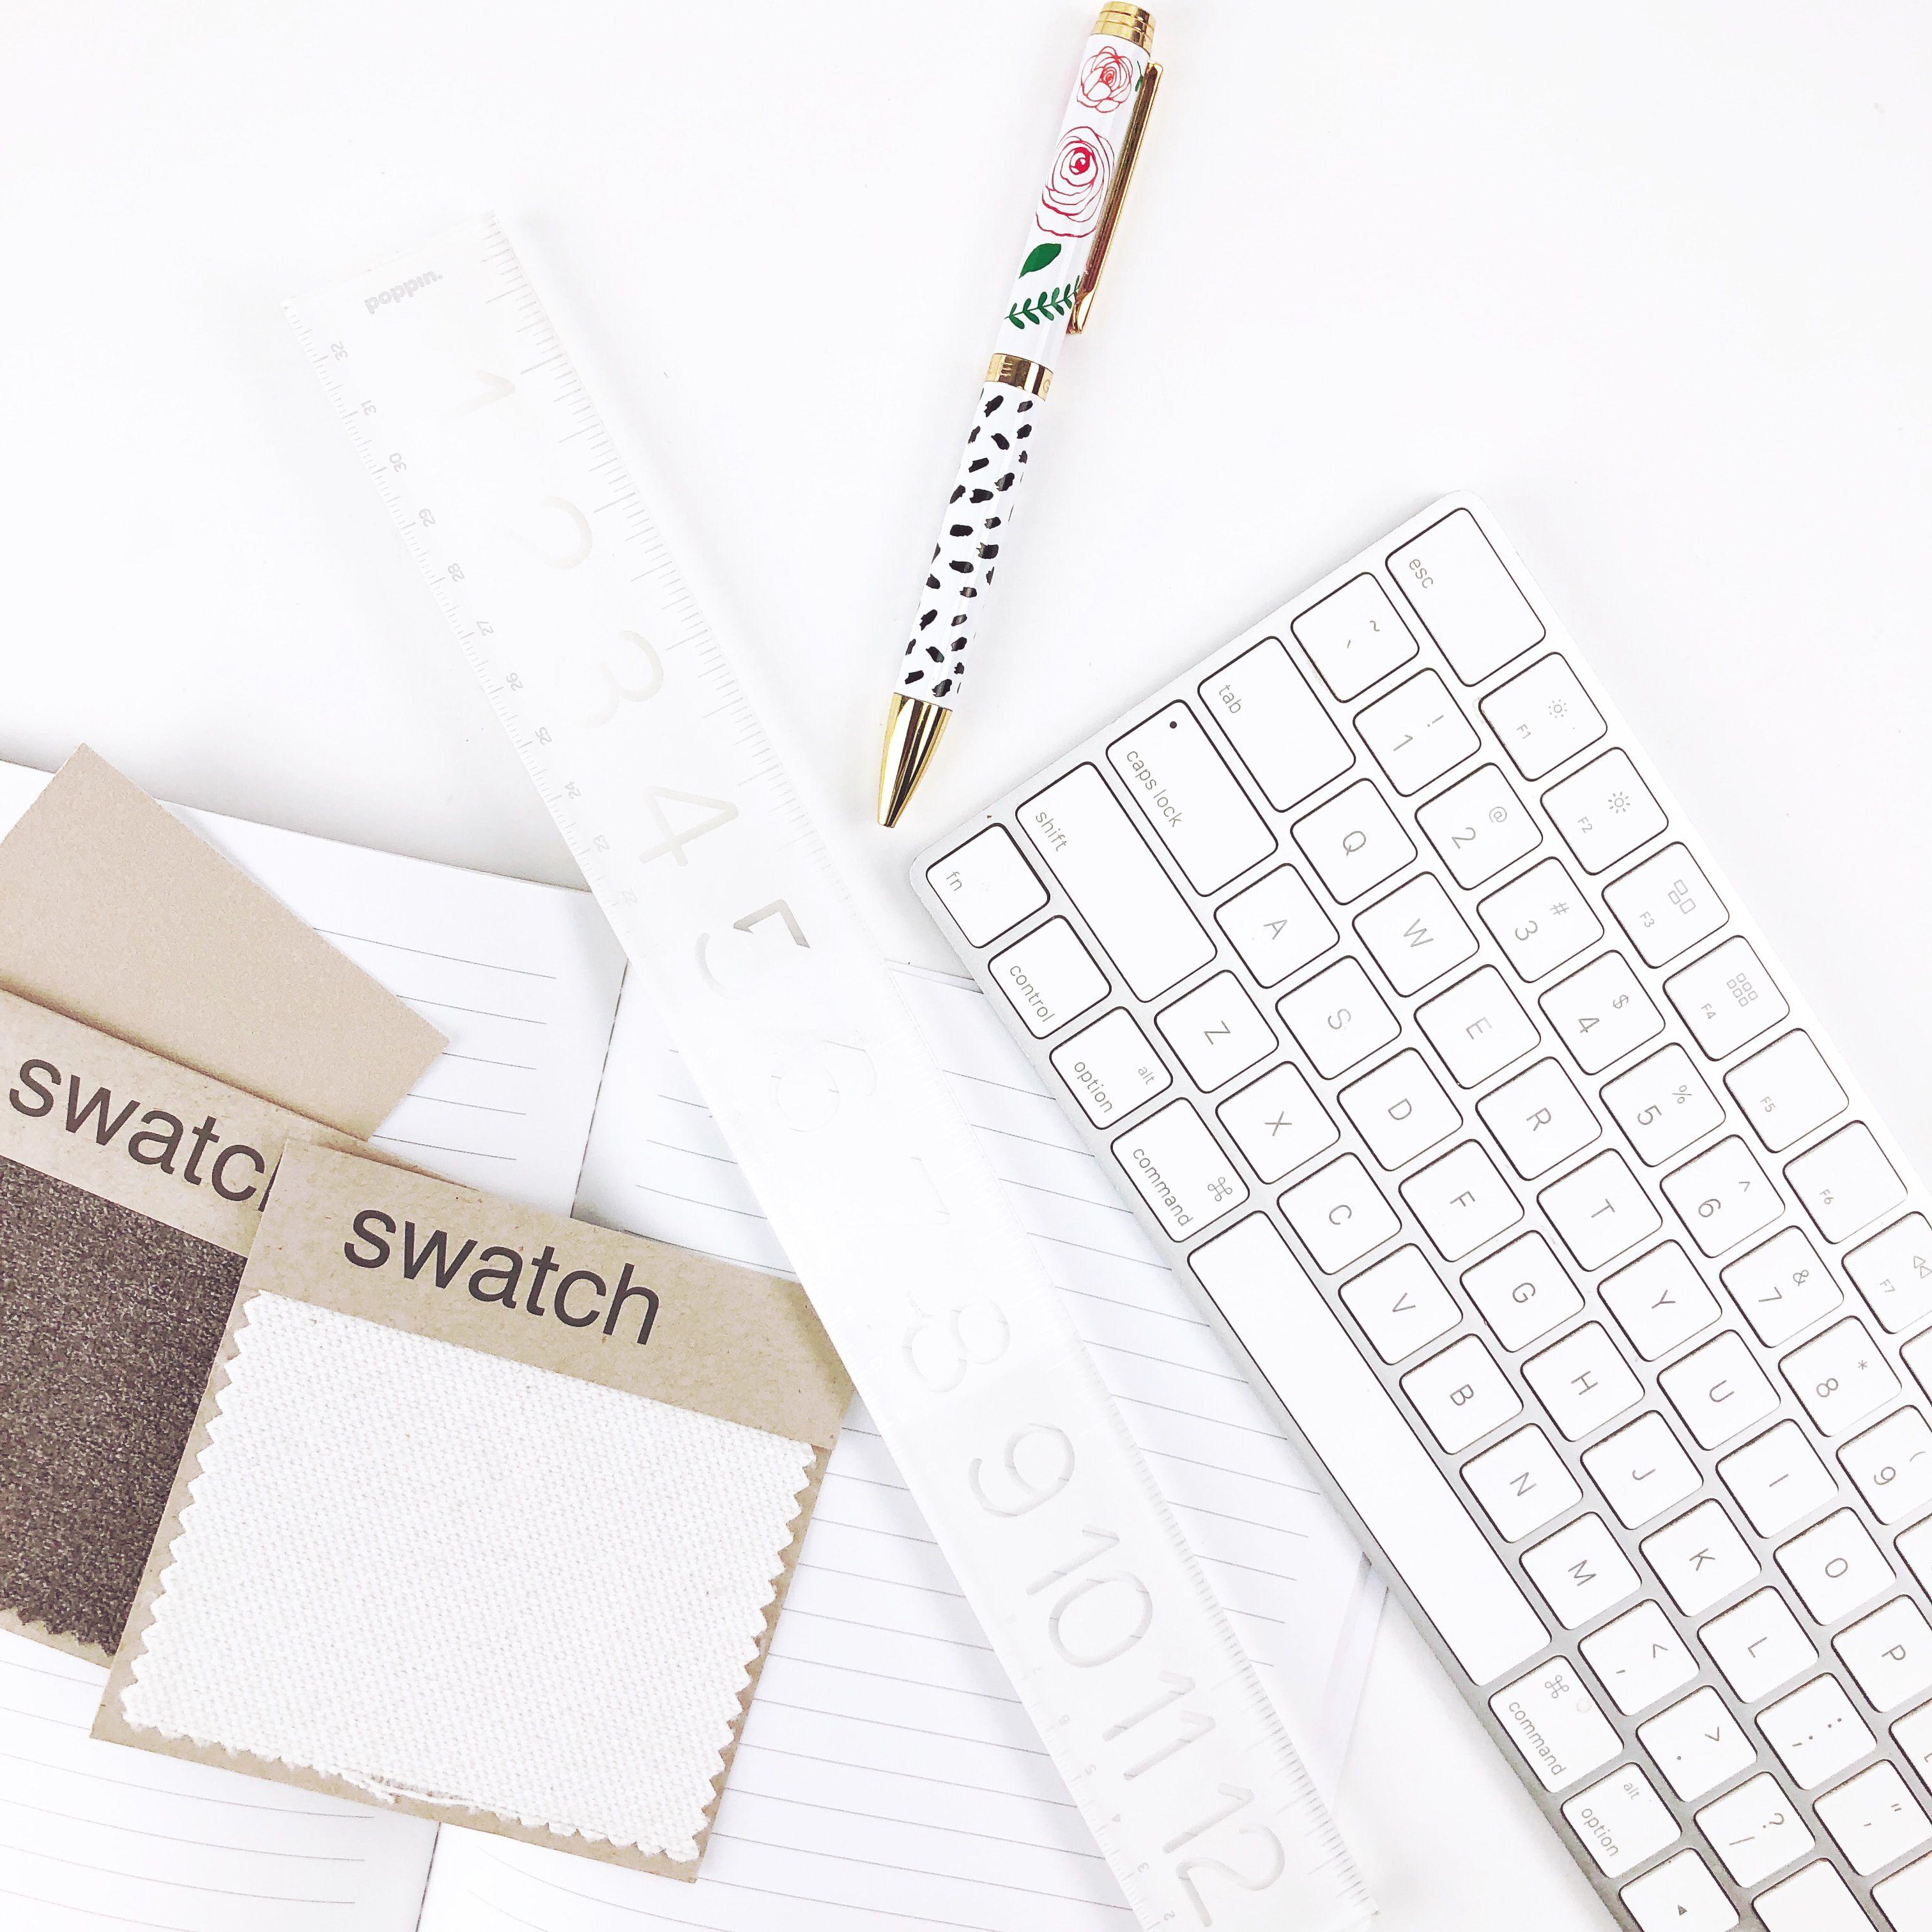 Free Online Room Design Software Applications